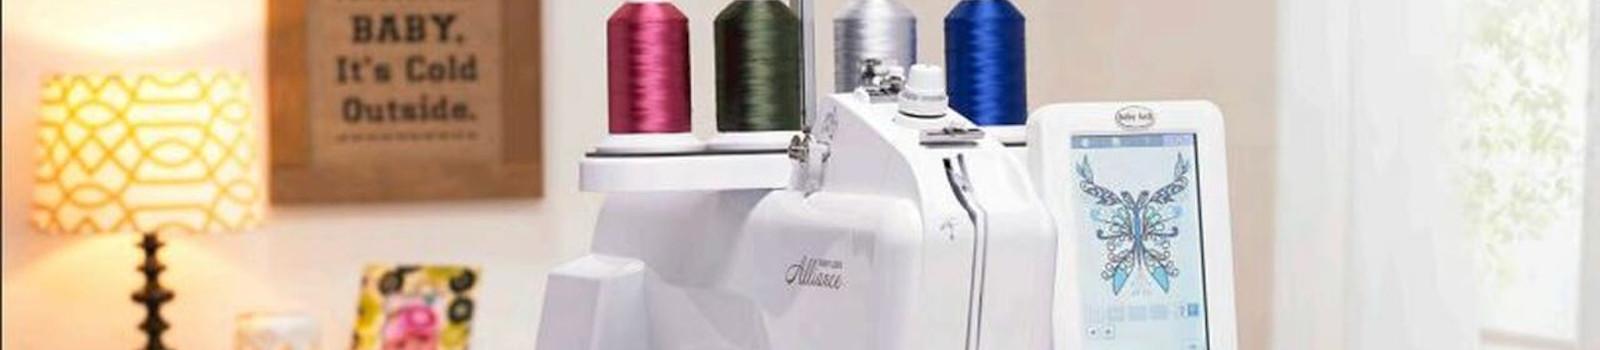 Baby Lock Alliance Embroidery Machine